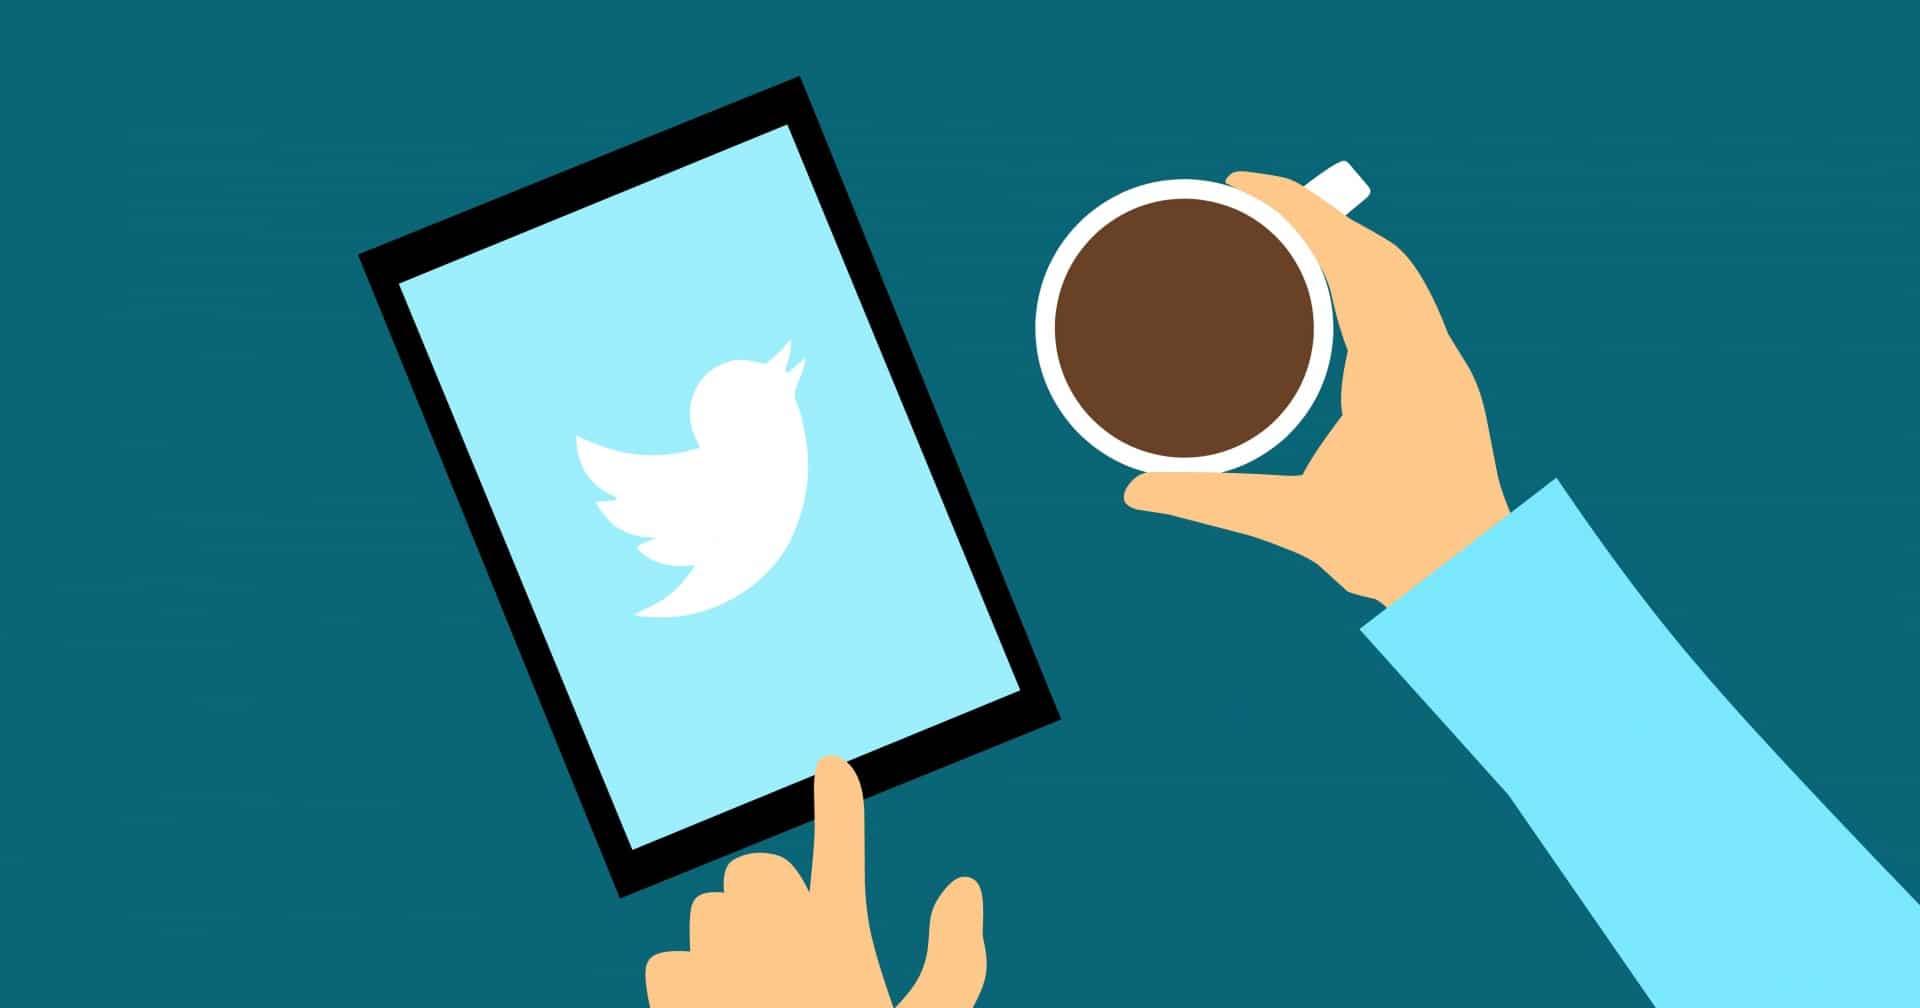 Twitter Domain Handle